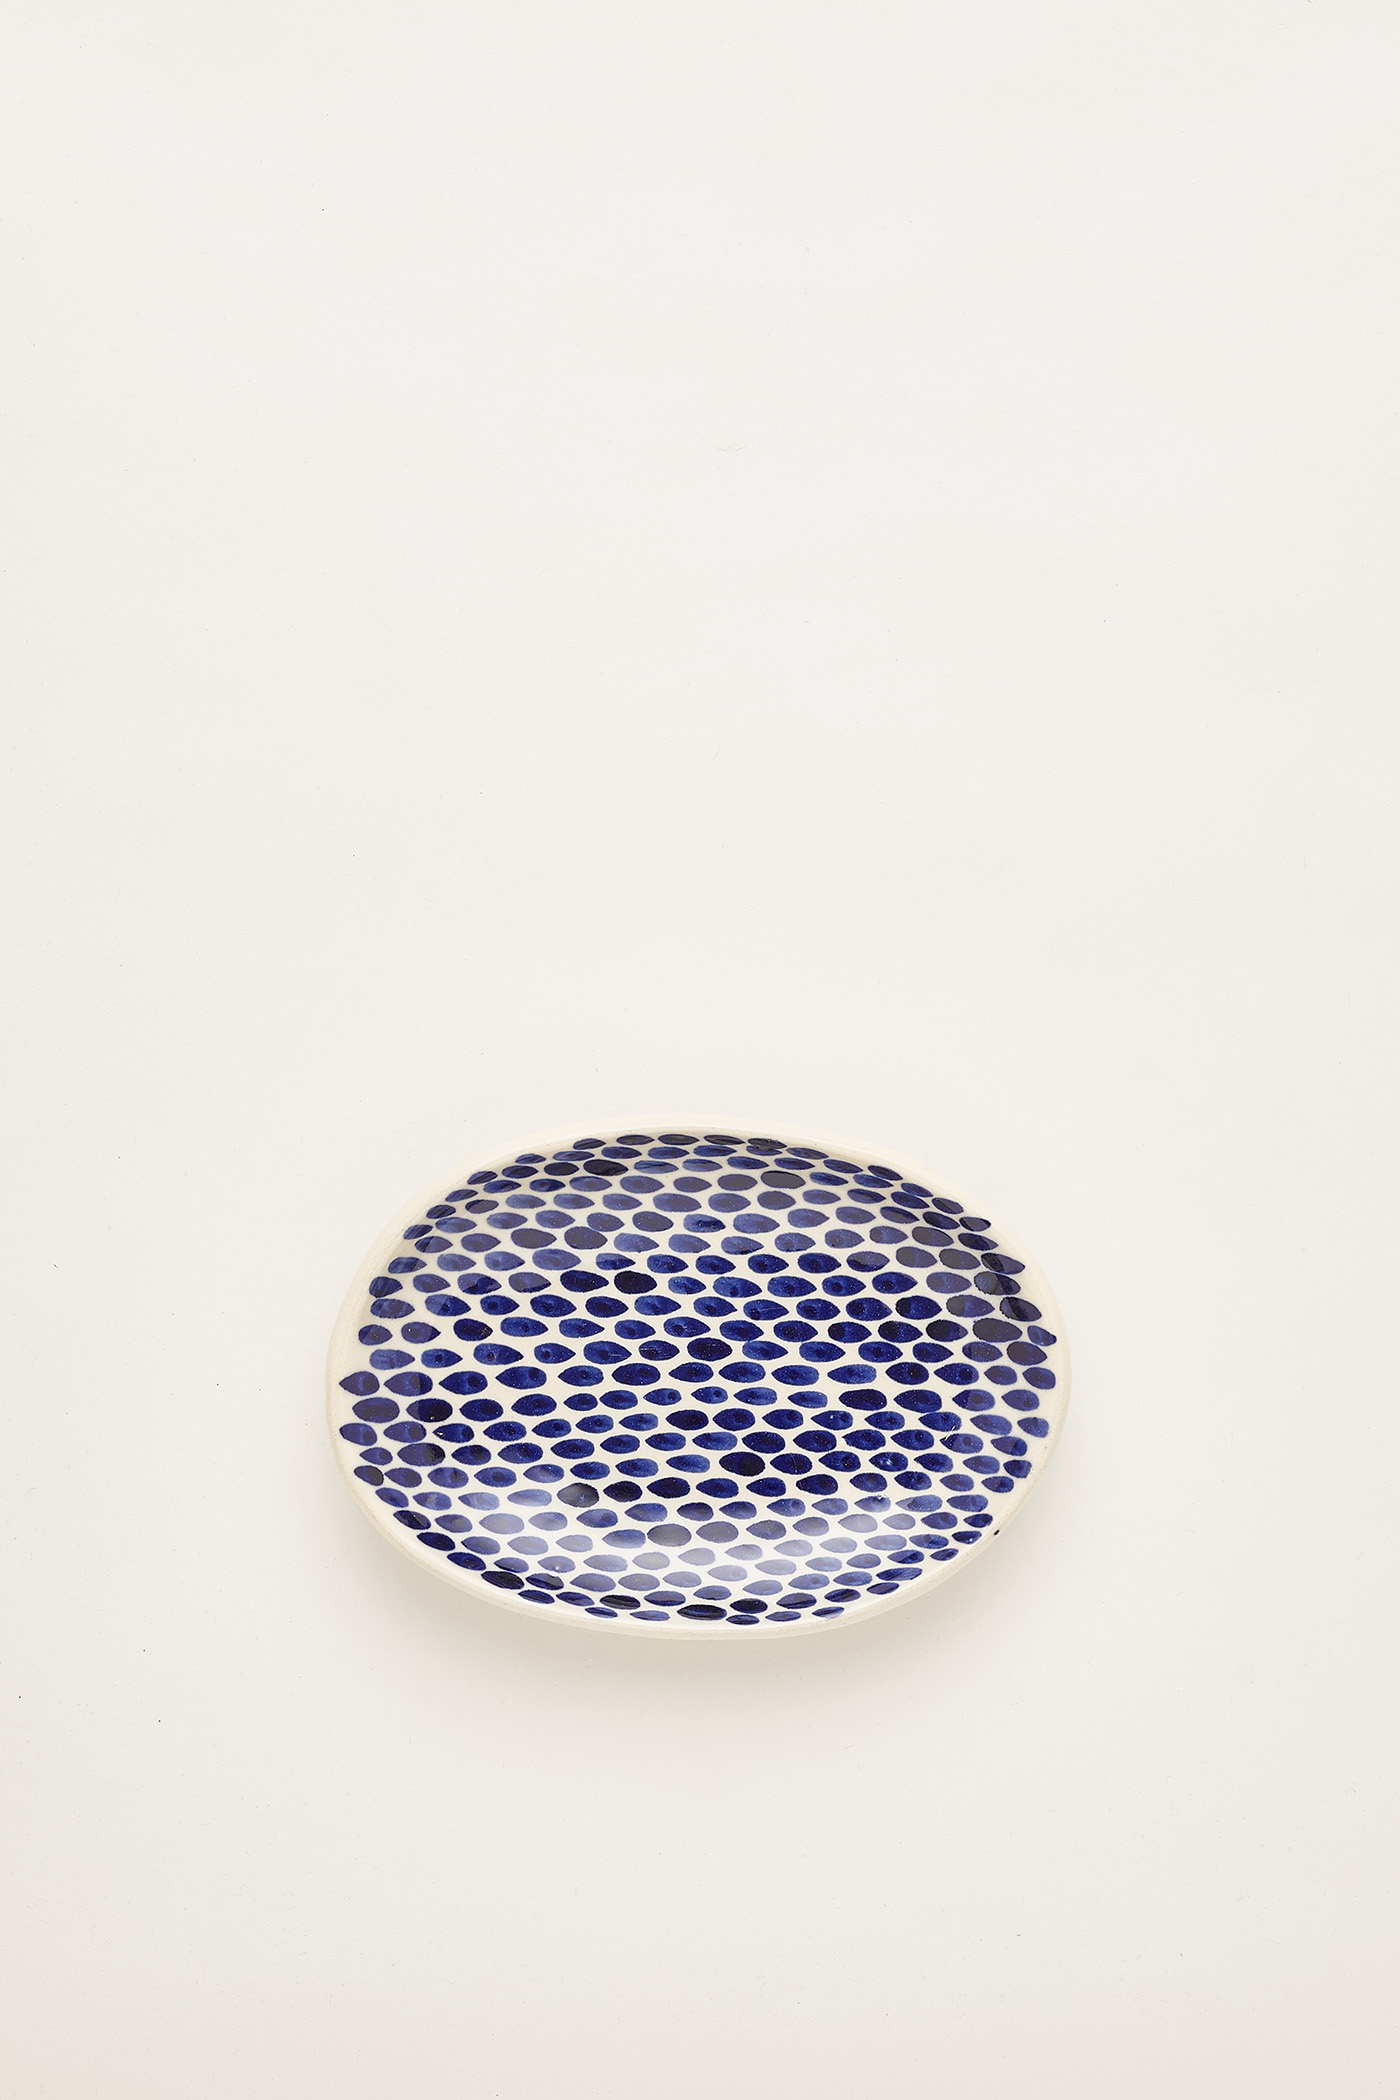 Tuhu Ceramics Oval Plate